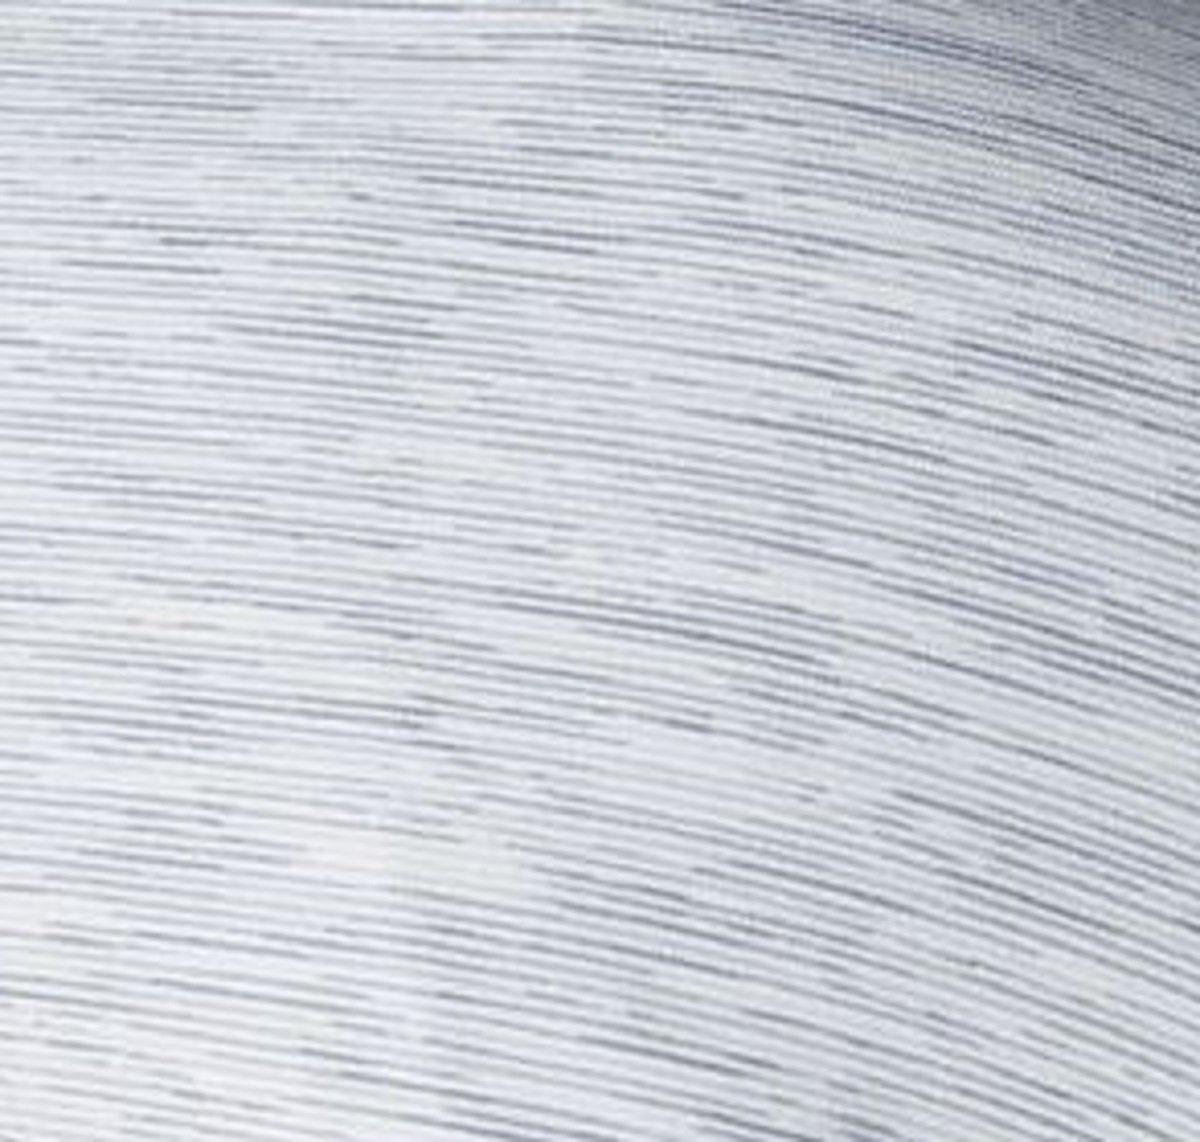 Lululemon Define Jacket (4, Wee Are From Space Ice Grey Alpine White) by Lululemon (Image #2)